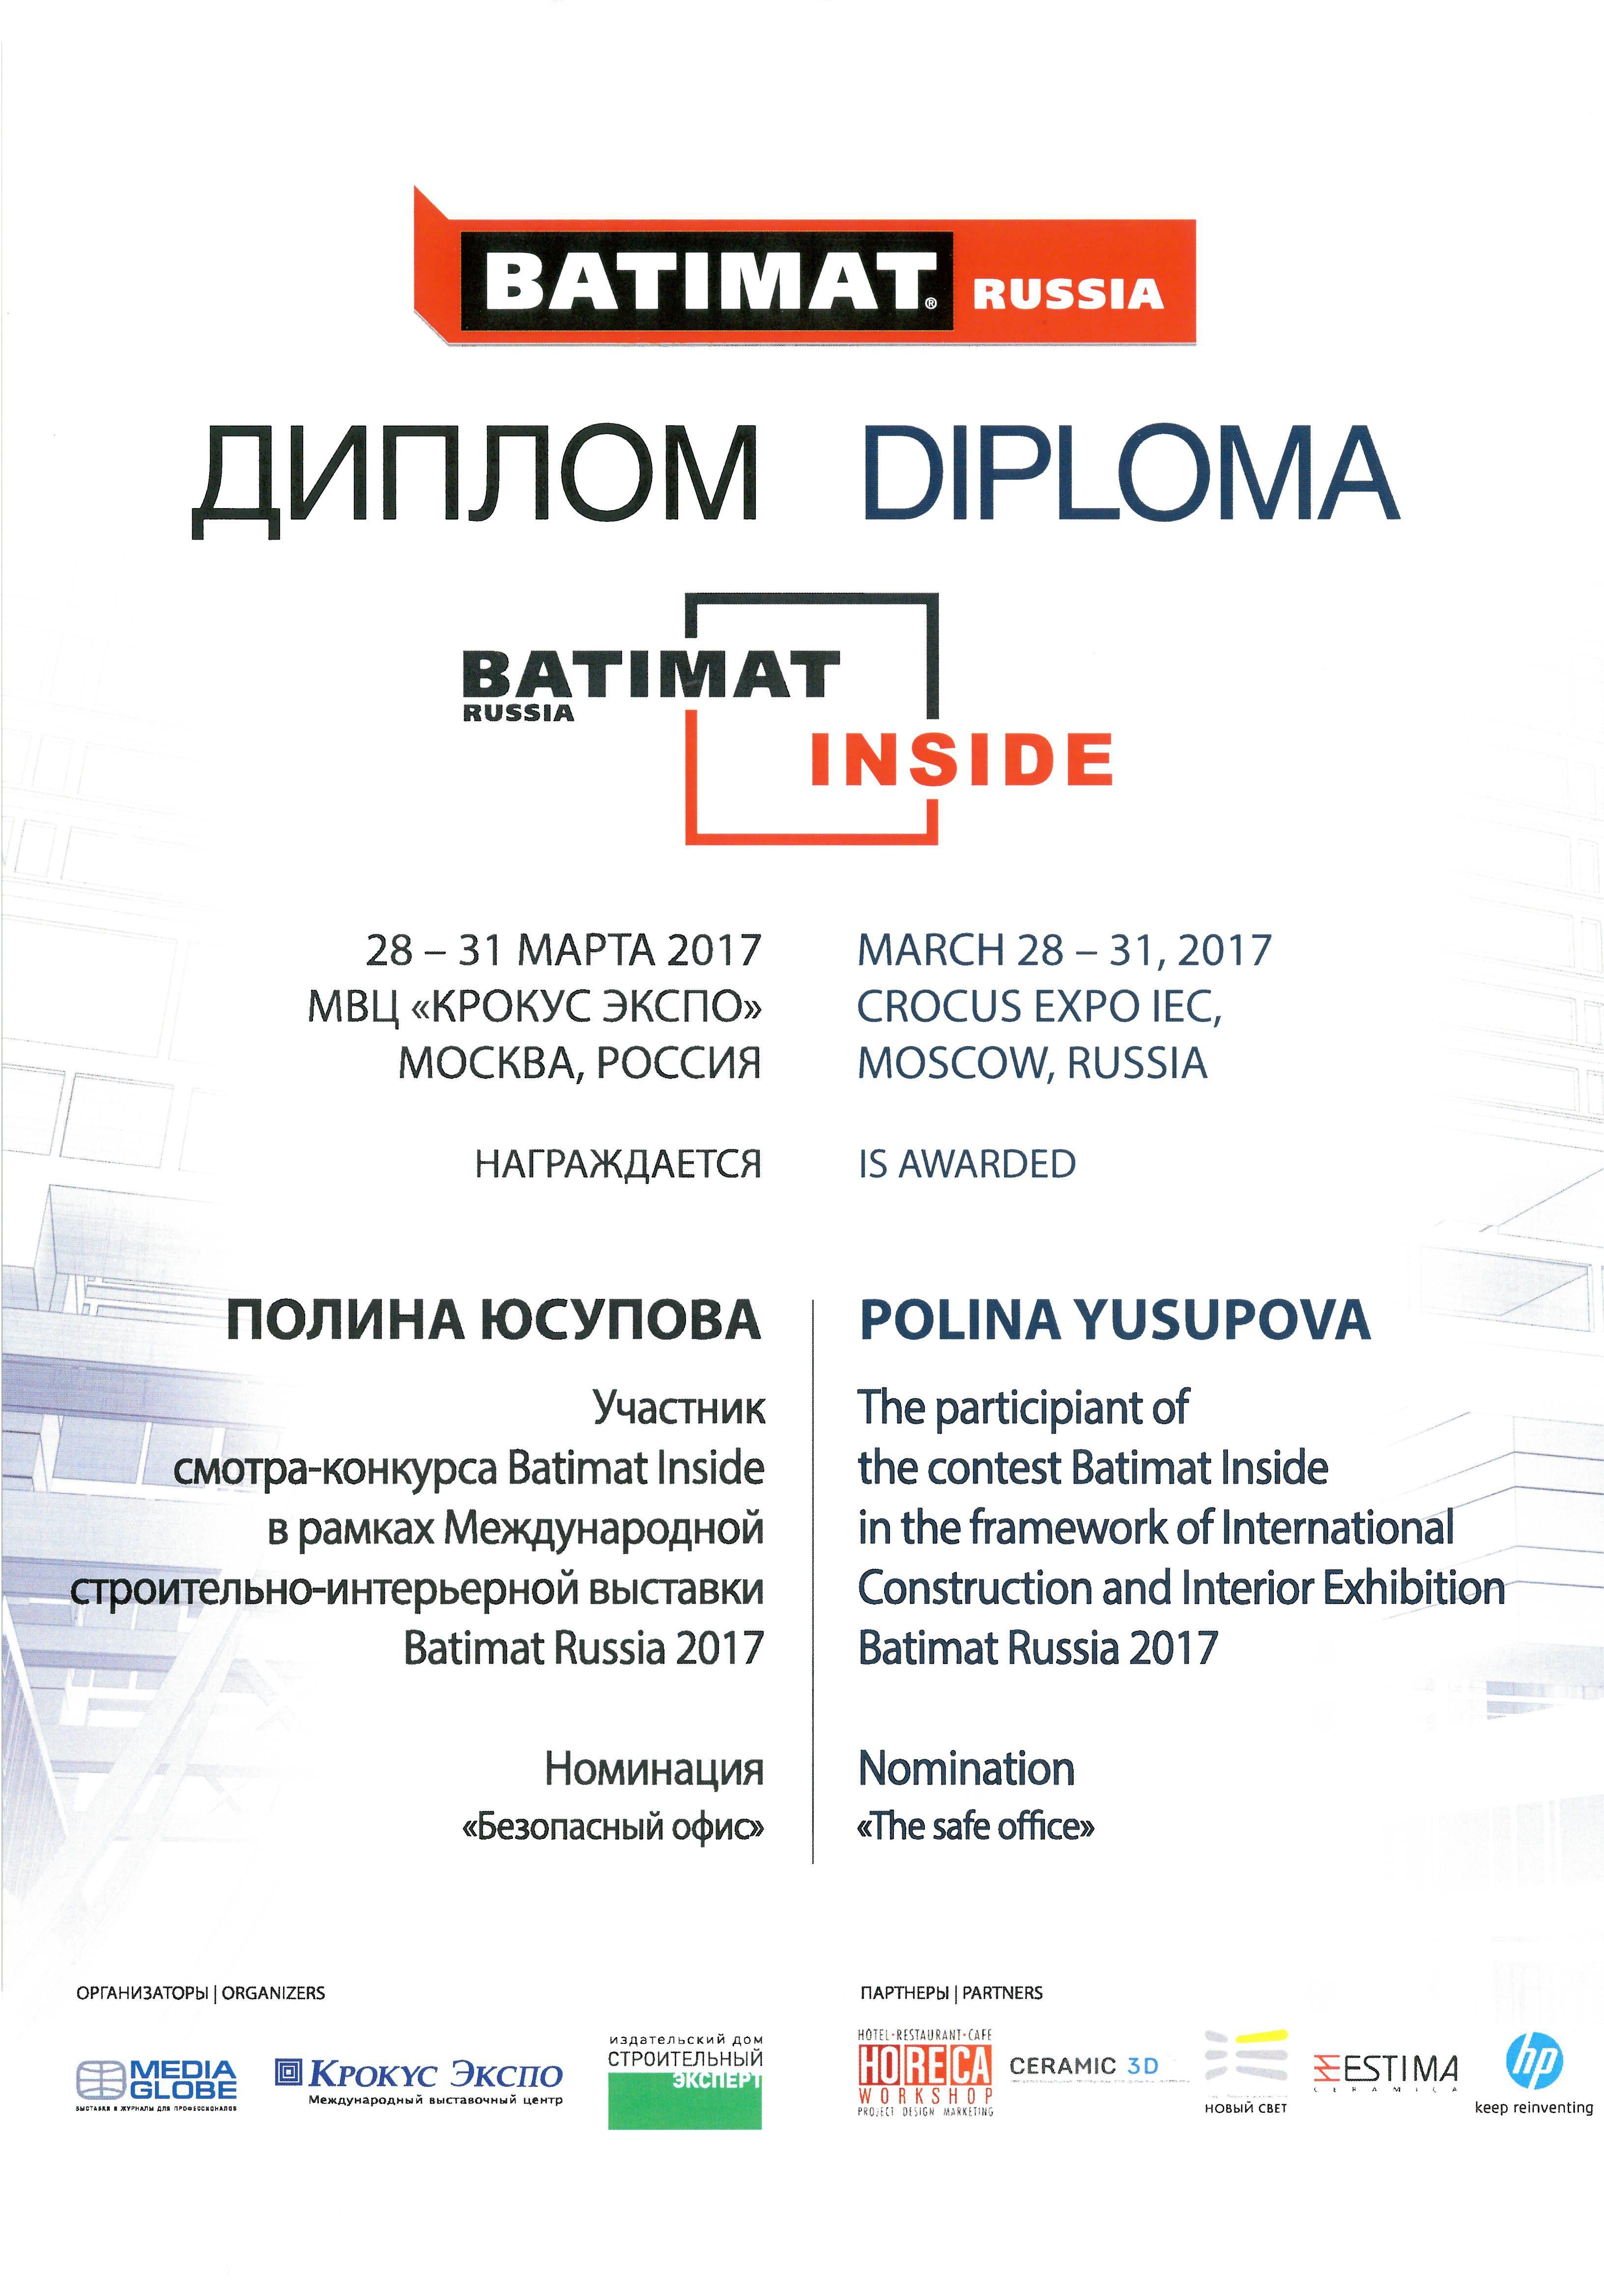 <a href='https://archreforma.ru/publikaciiinagrady/batimap-inside/'>Посмотреть подробнее... 'BATIMAP INSIDE</a>